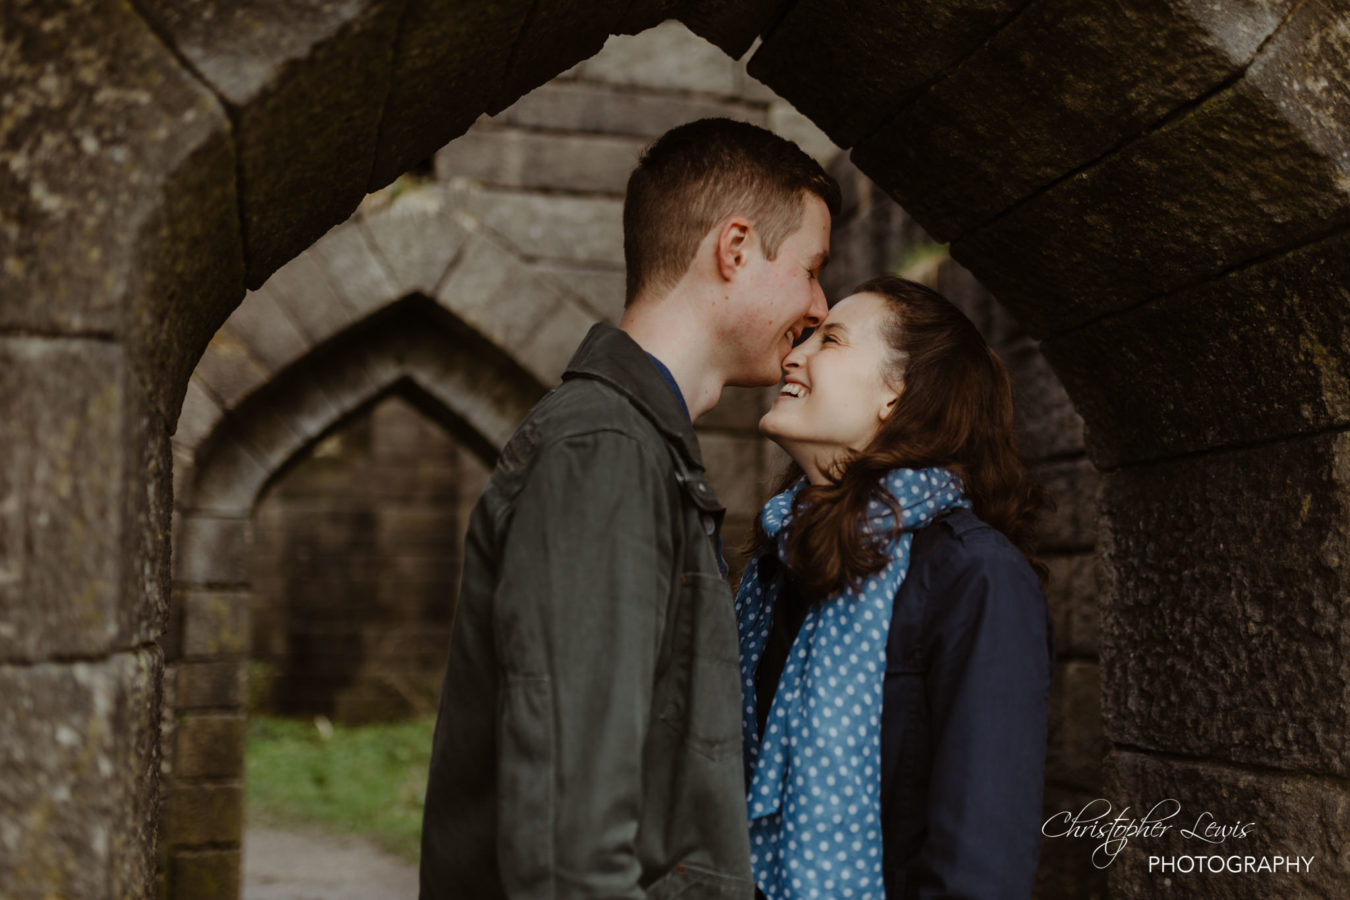 Colshaw-Hall-Pre-Wedding-Photo-5